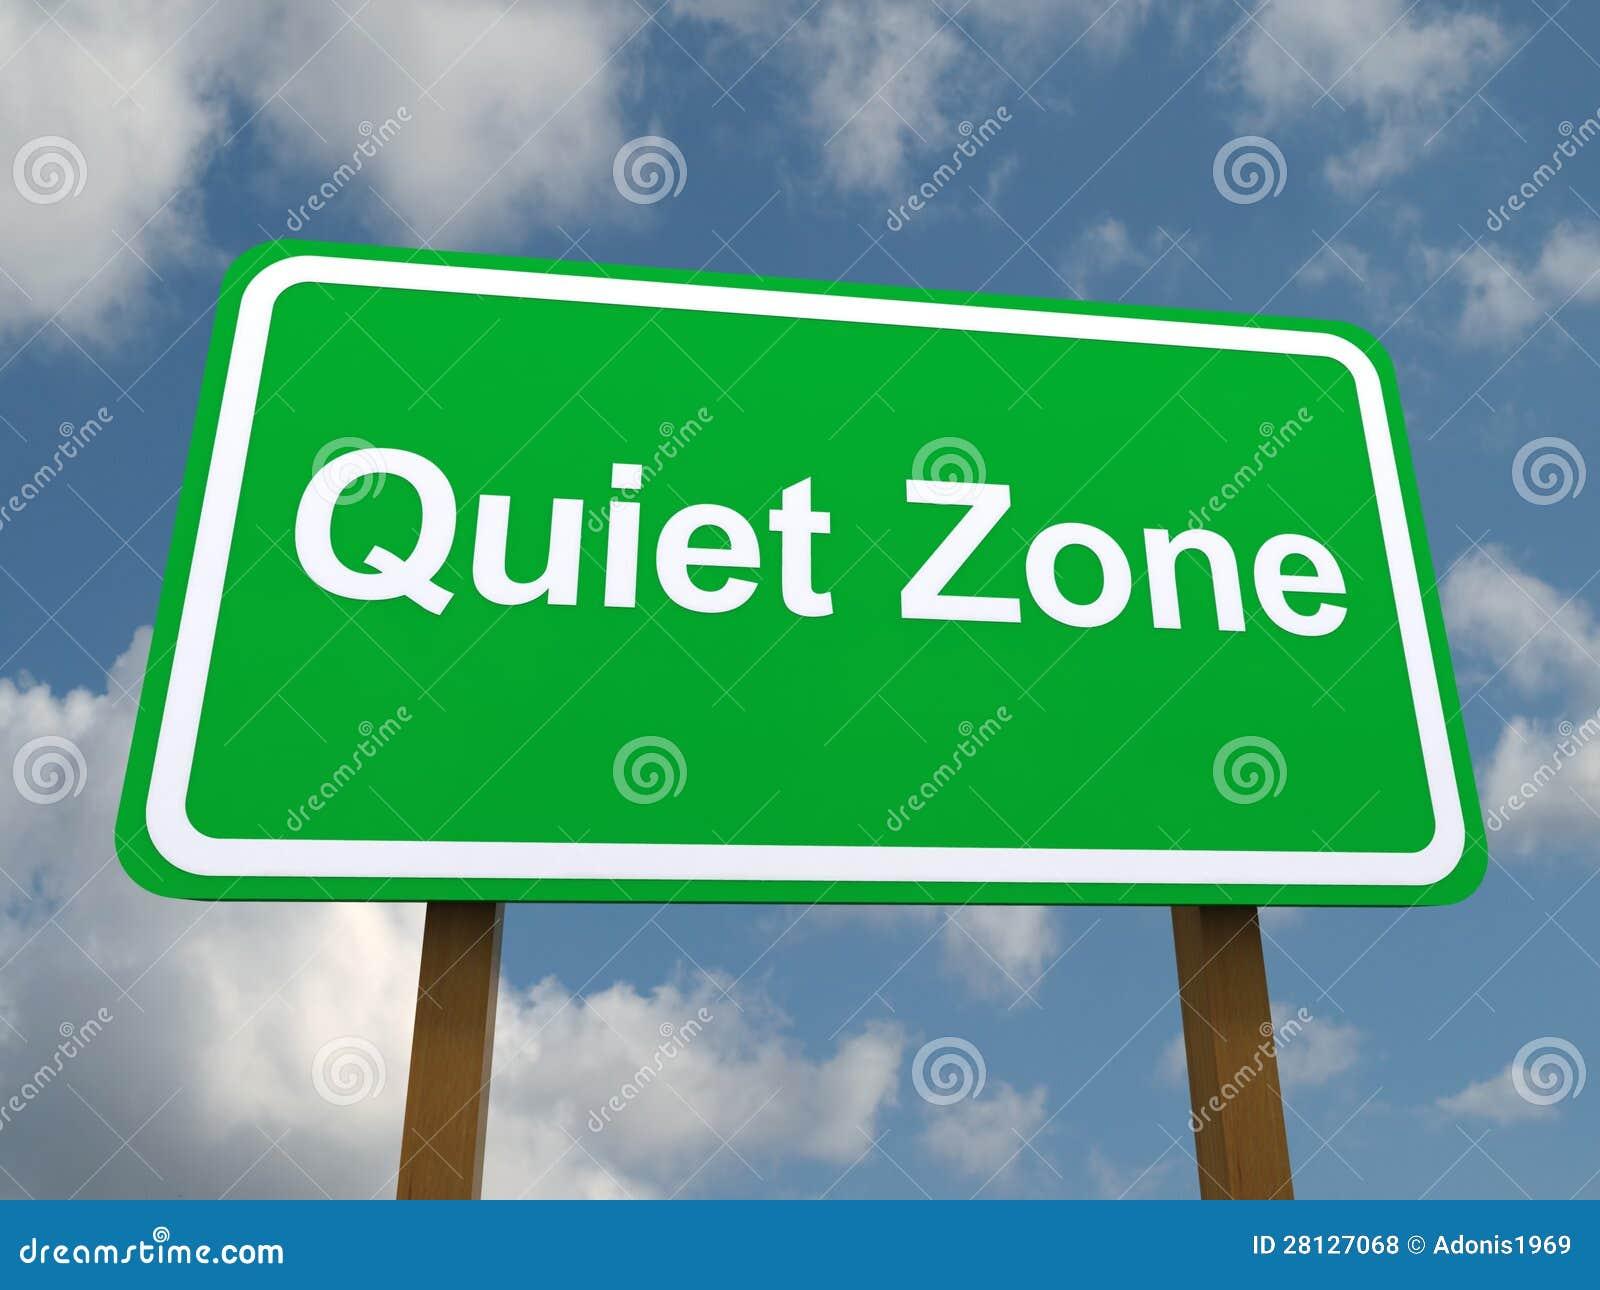 free clipart quiet zone - photo #16